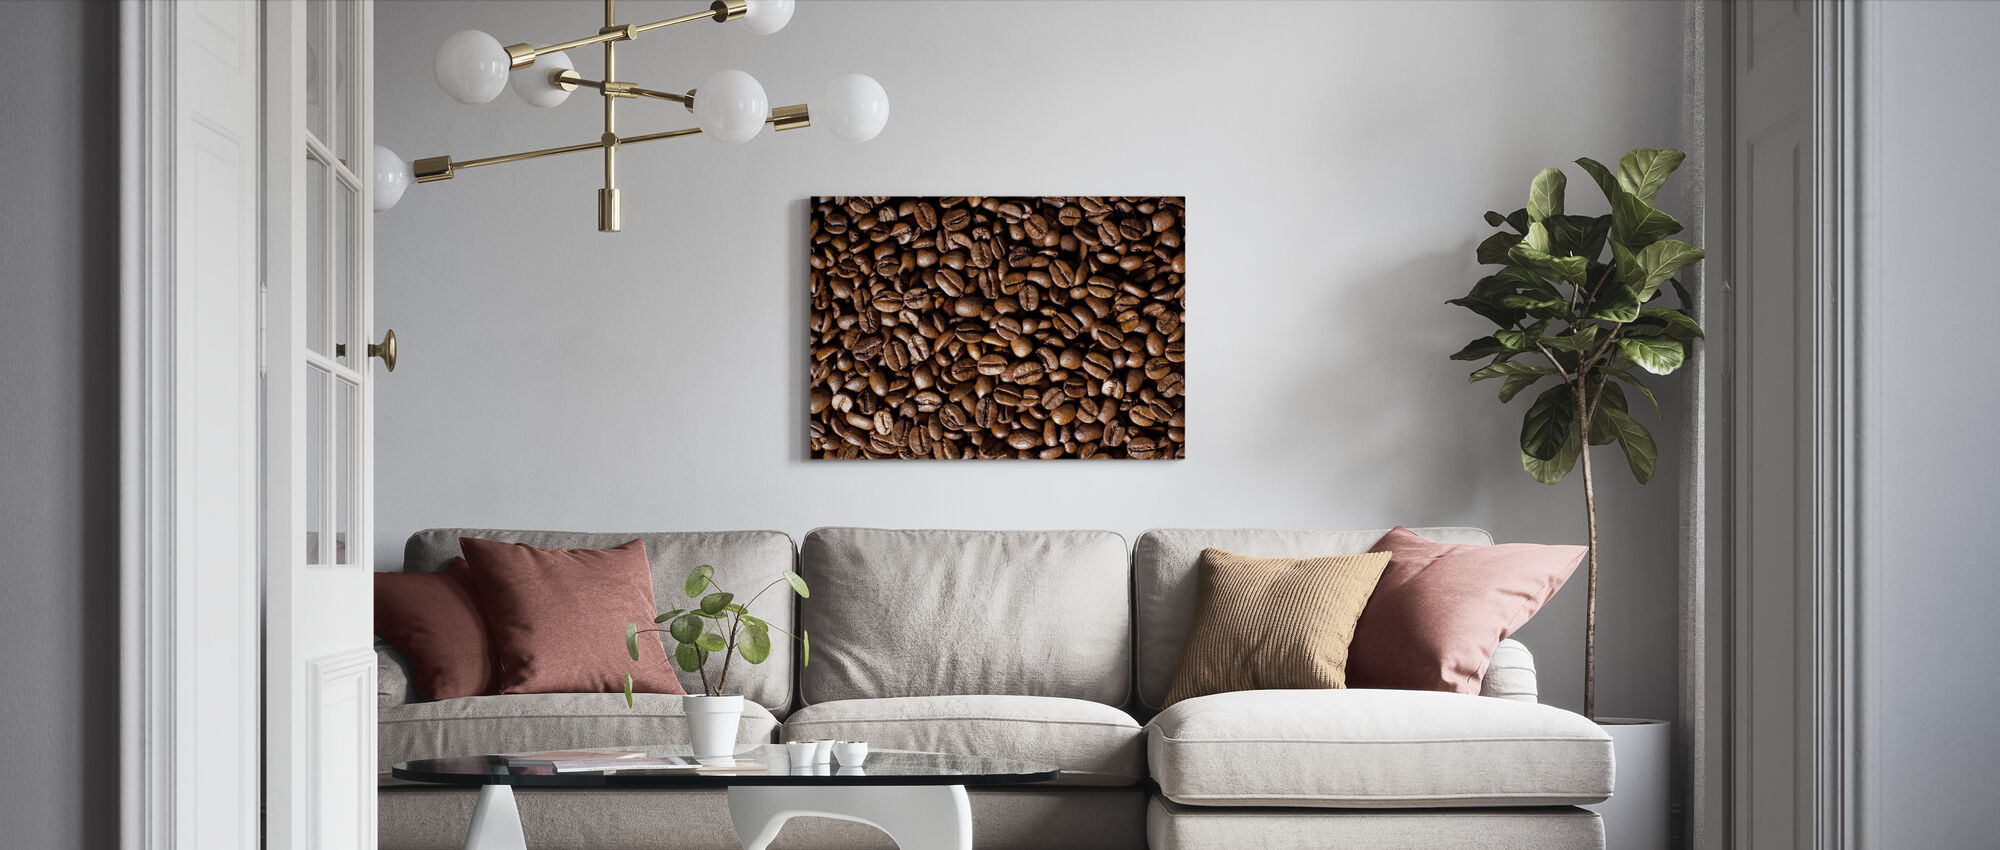 Kaffebønner - Lerretsbilde - Stue